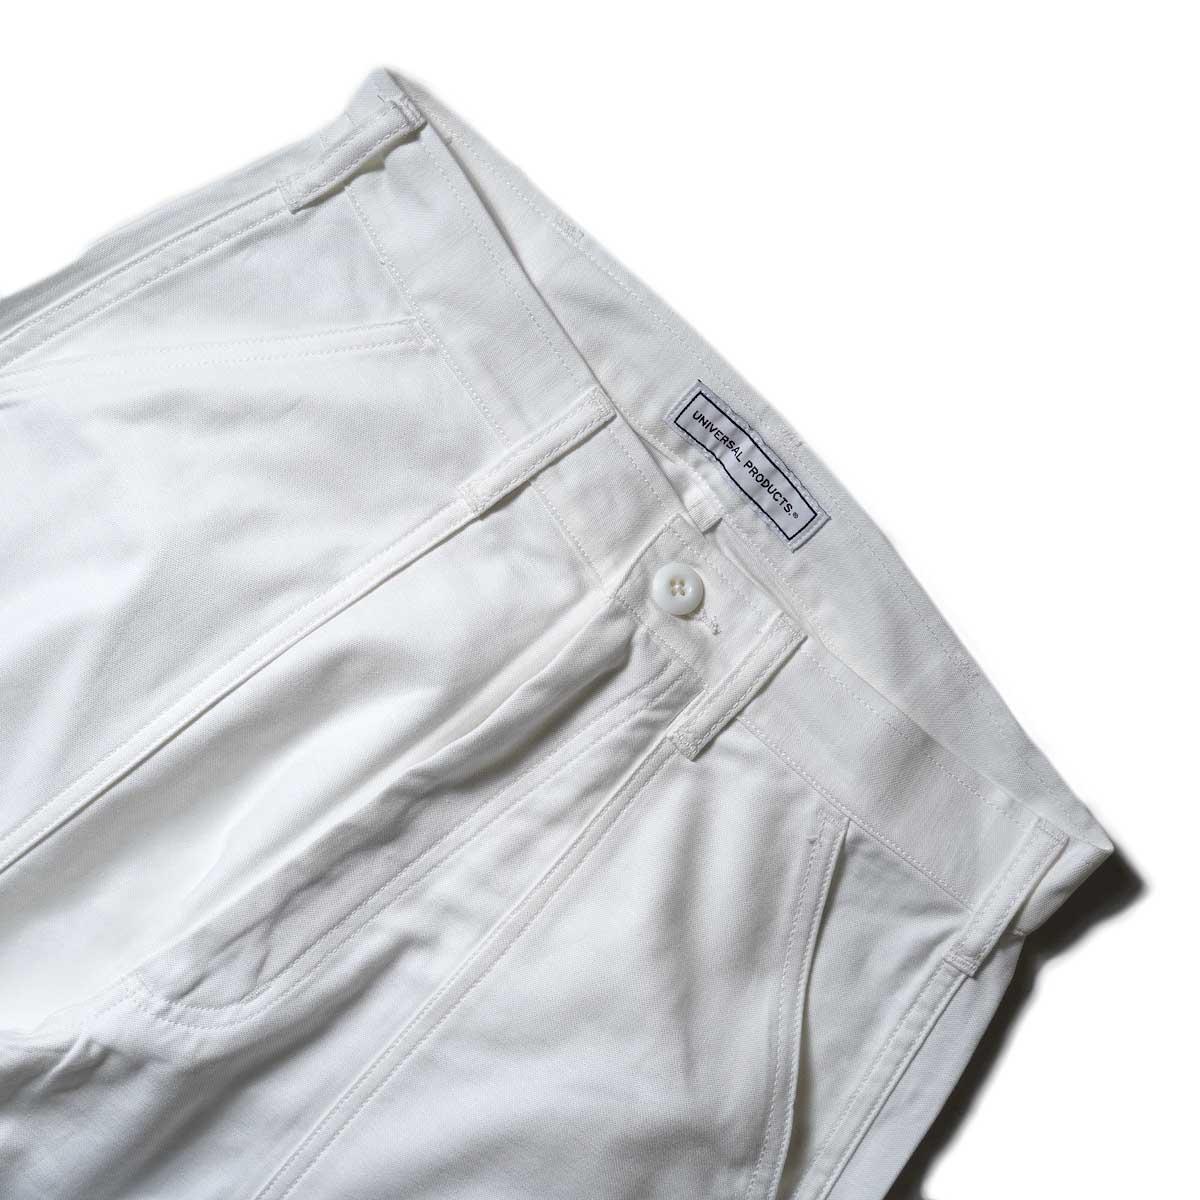 UNIVERSAL PRODUCTS / Gung Ho 1tuck Baker Pants (Ivory)ウエスト